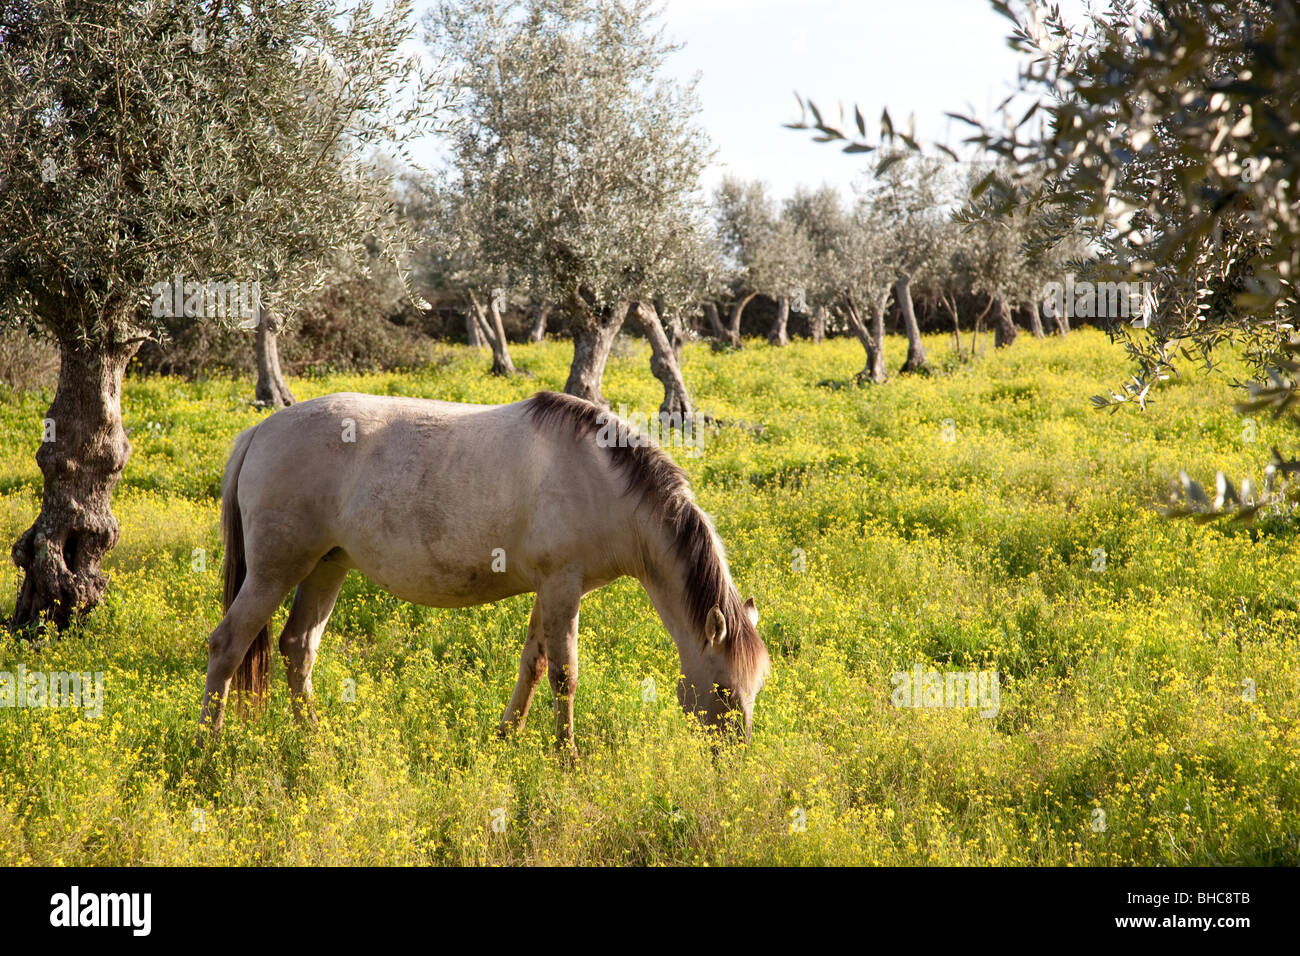 Pregnant mare from the Alter Real bred (Lusitano Horse), in Coudelaria de Alter. Alter do Chão, Portalegre, - Stock Image